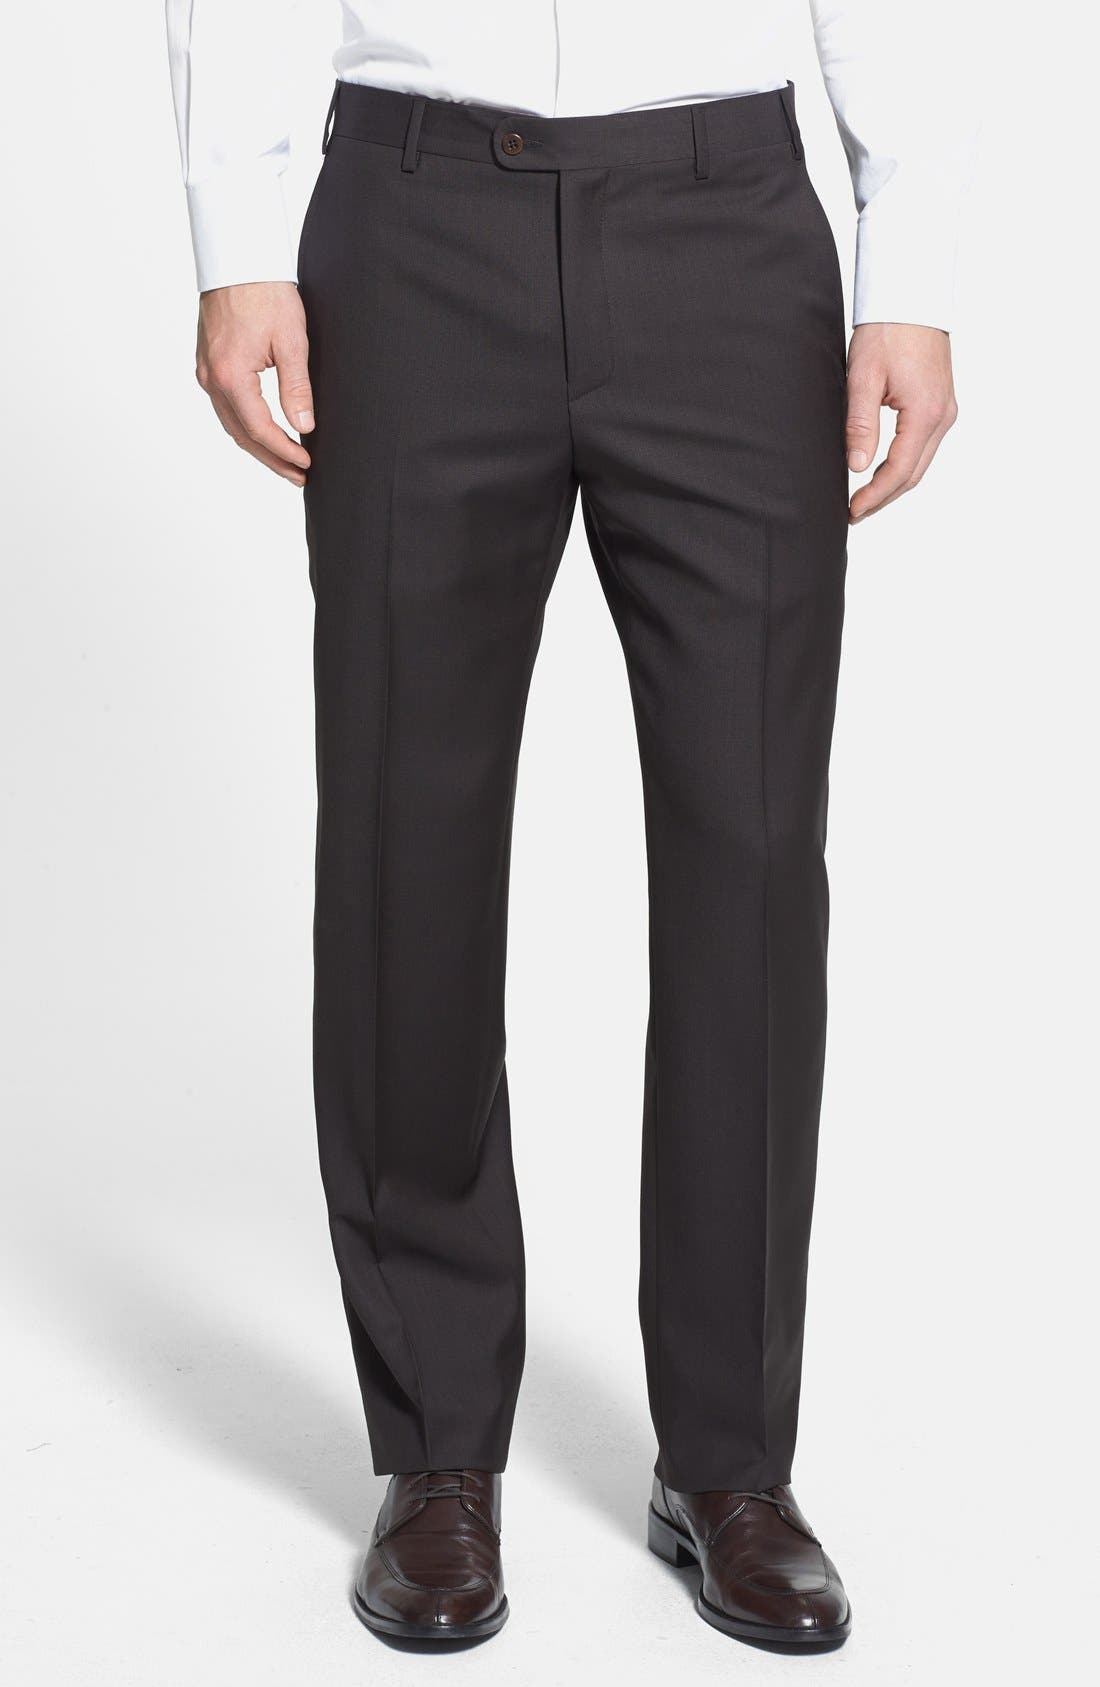 Alternate Image 1 Selected - Zanella 'Devon' Flat Front Wool Trousers